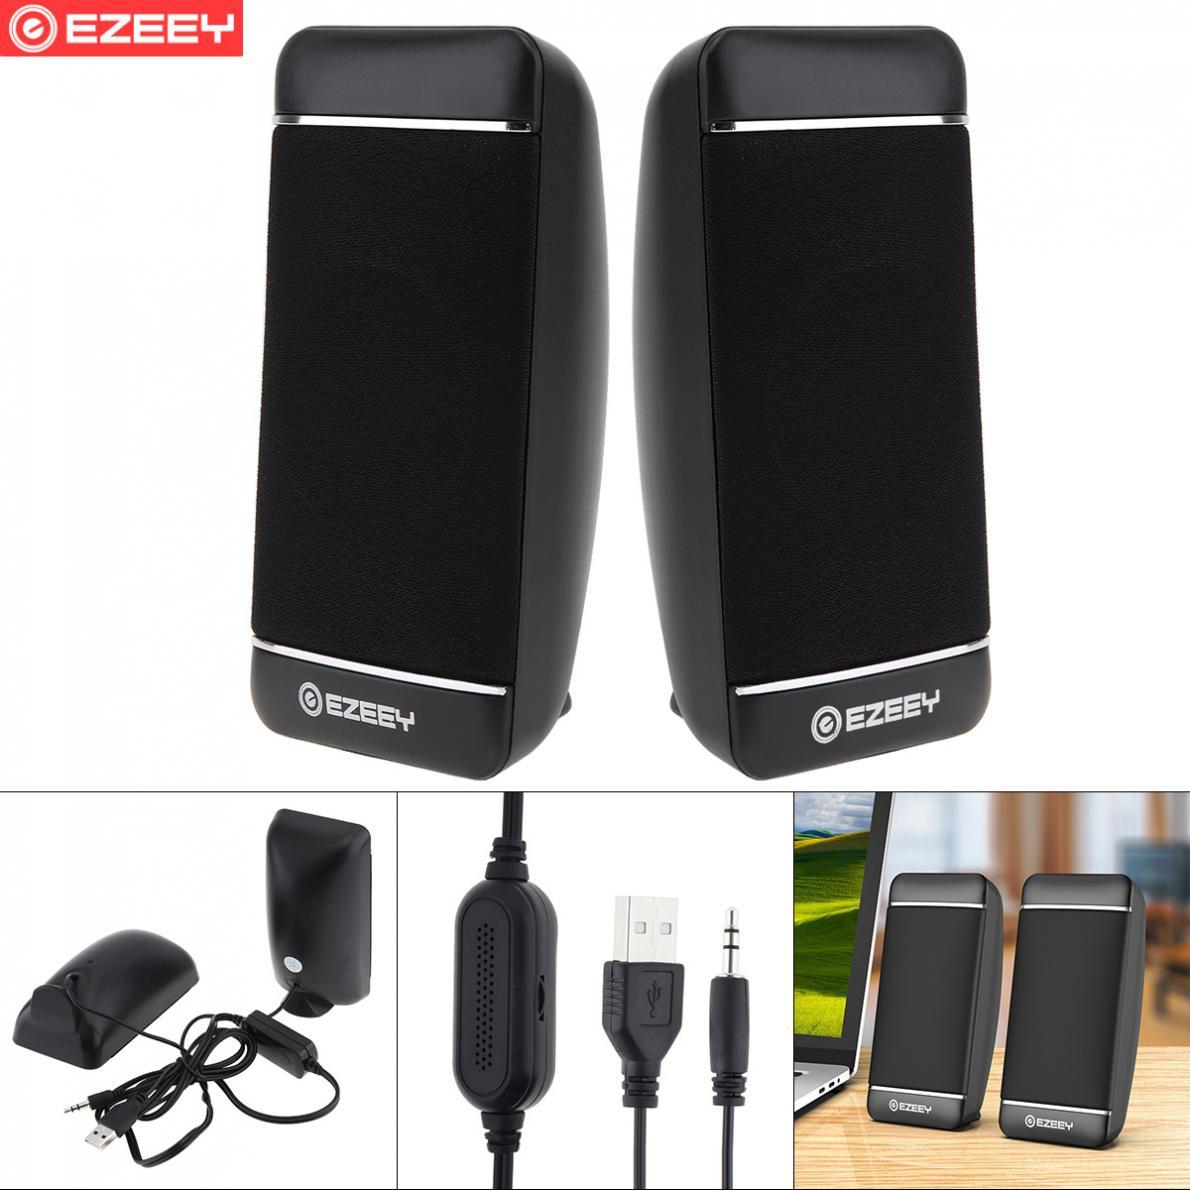 EZEEY S4 USB 5V Subwoofer Speaker with 3.5MM Audio Socket and Volume Control